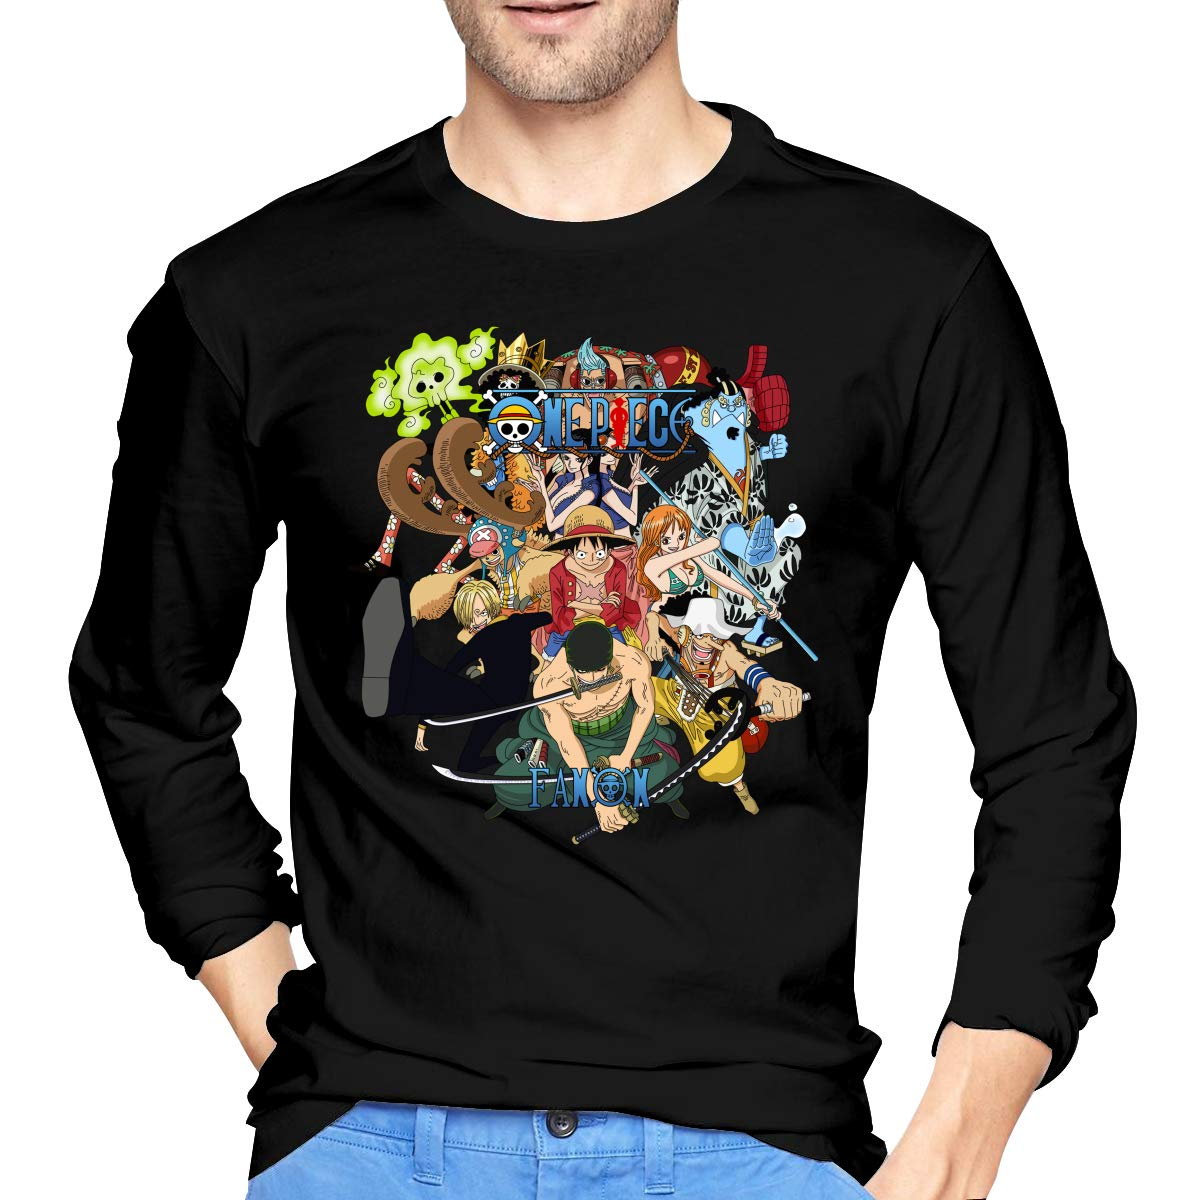 Vintage Anime One Piece T Shirt X Black